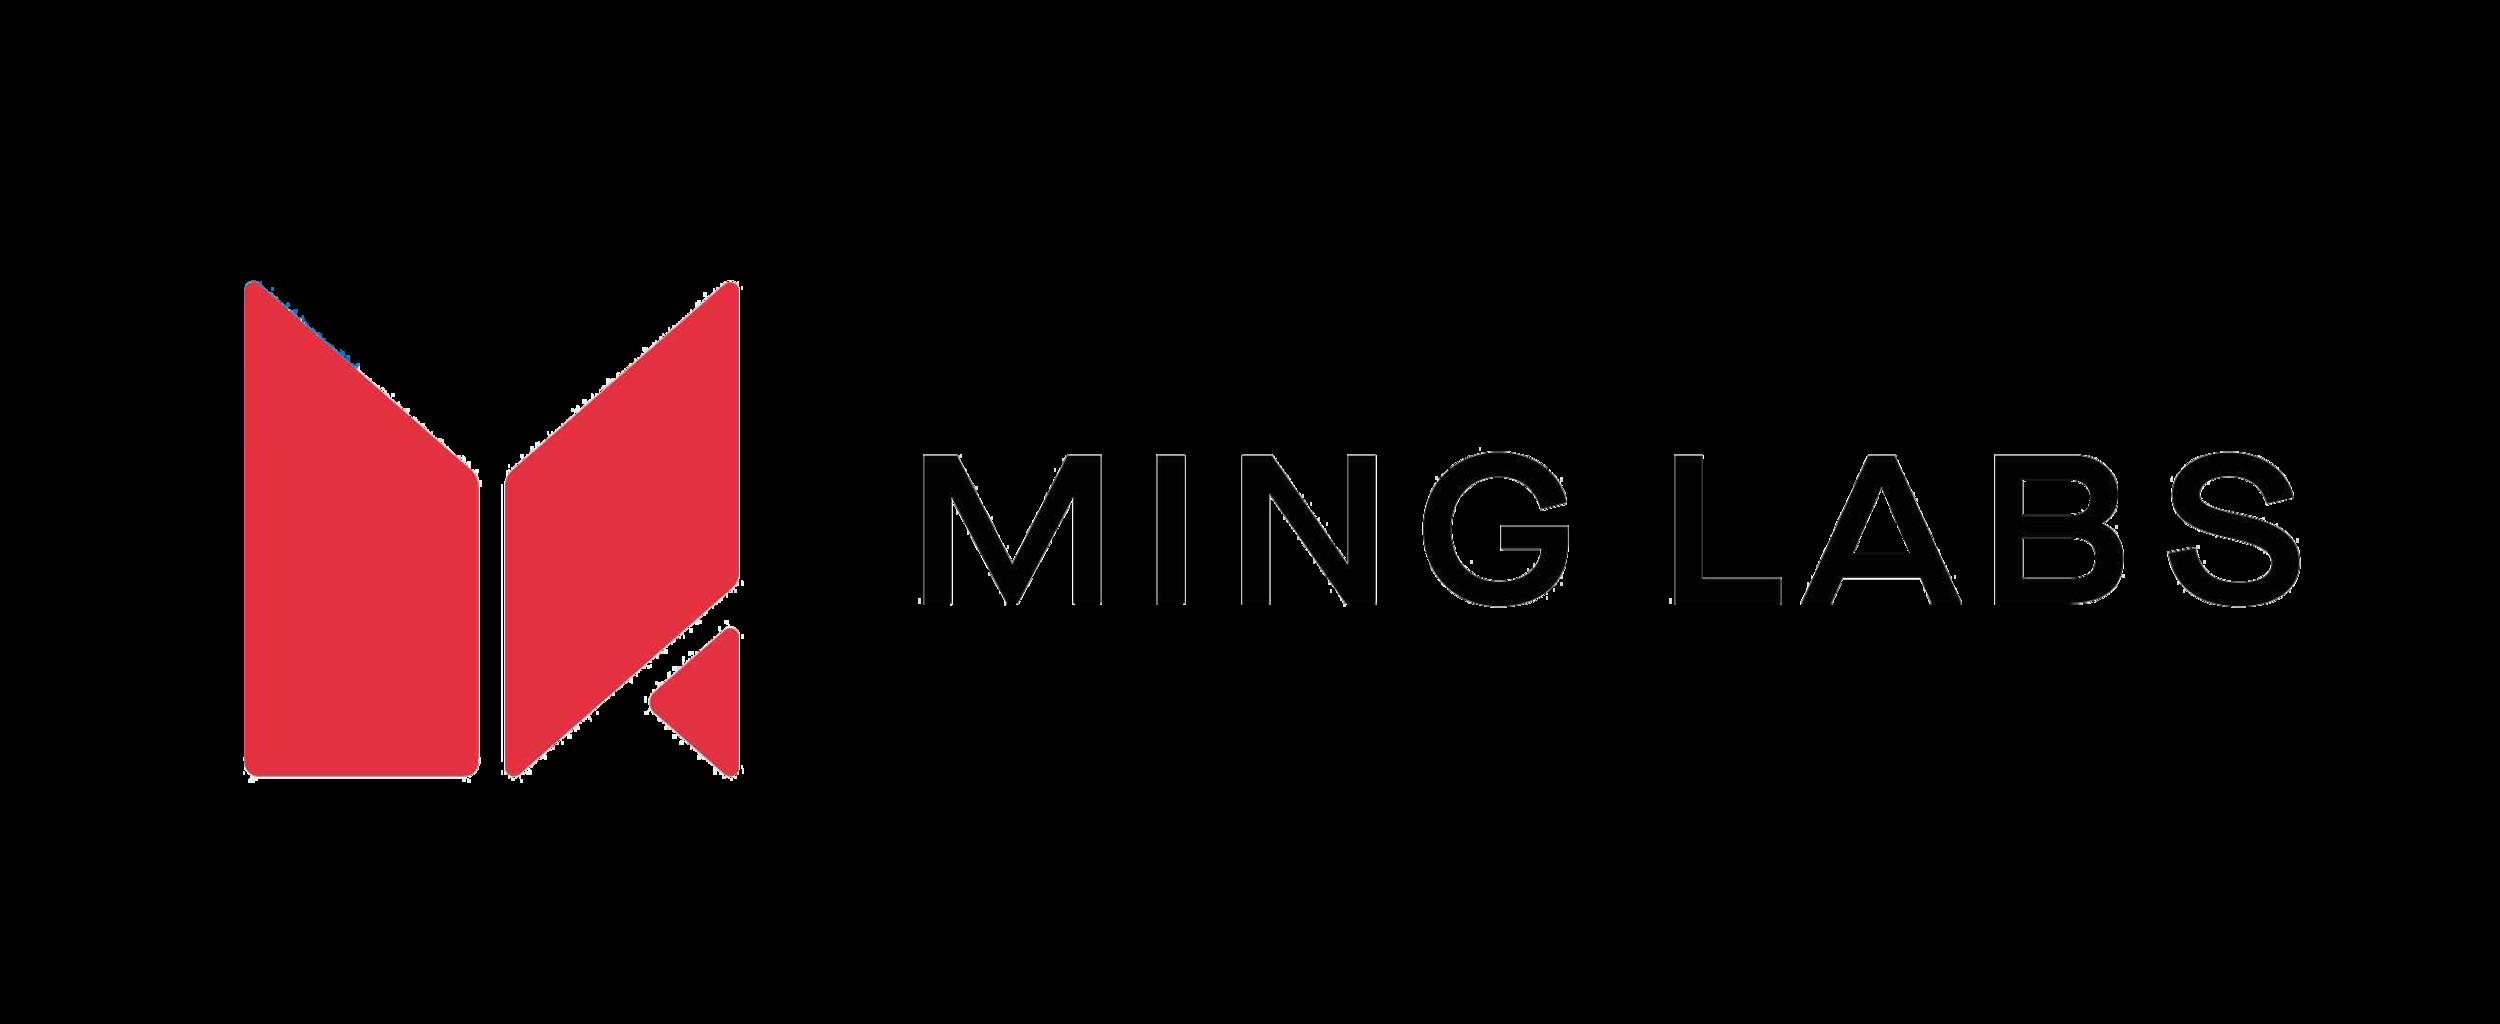 Ming Labs-Berlin.png